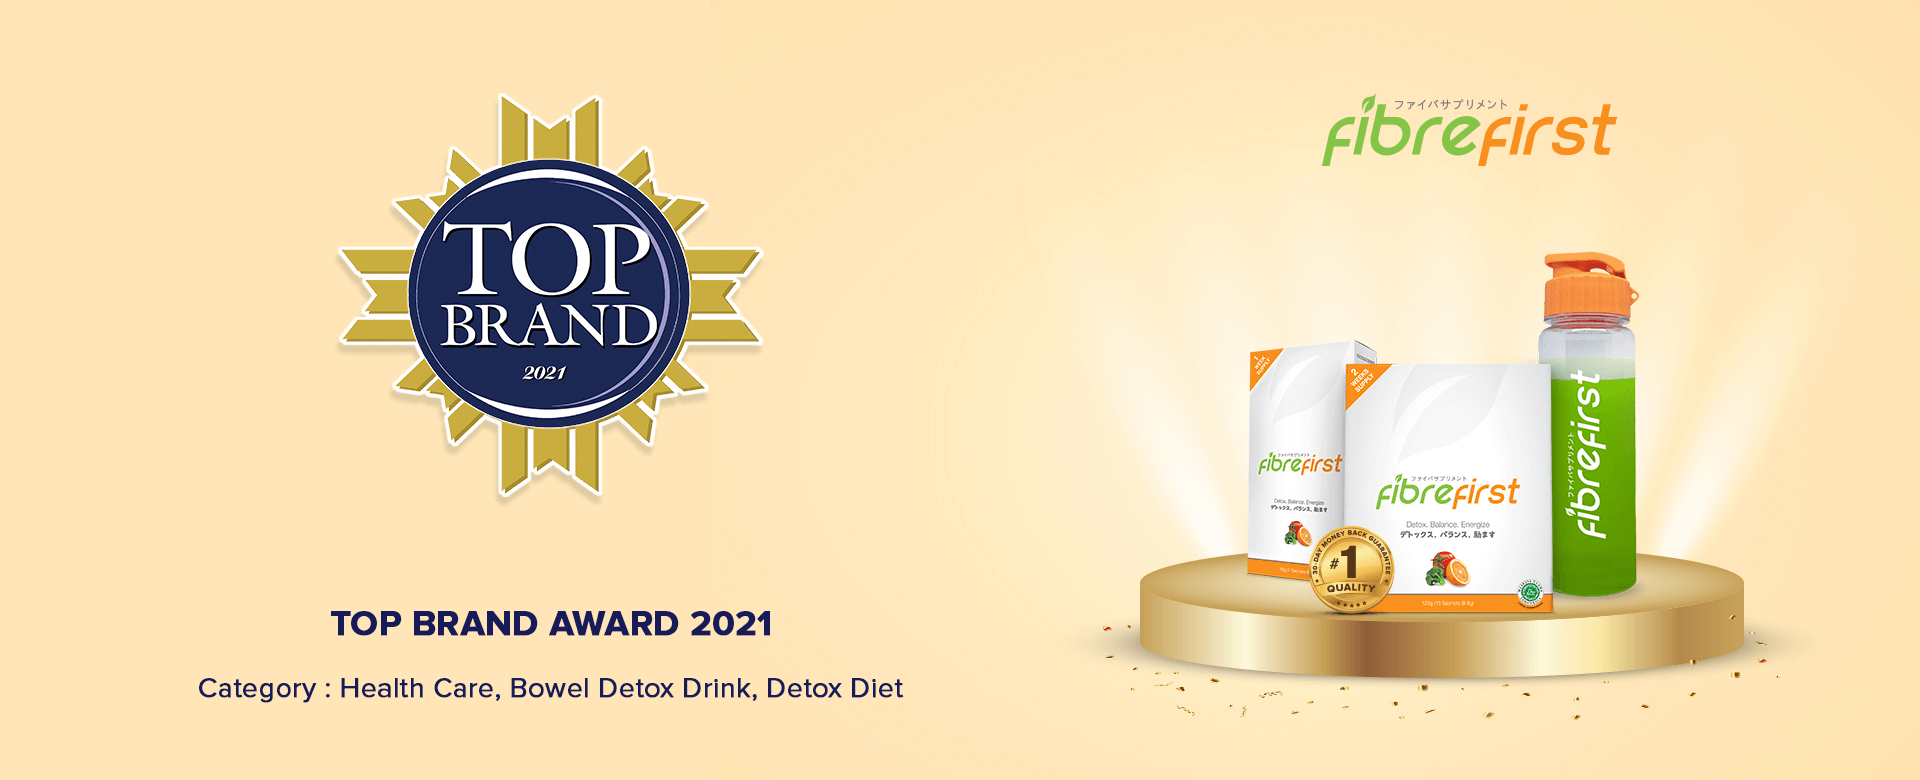 Top Brand Award 2021